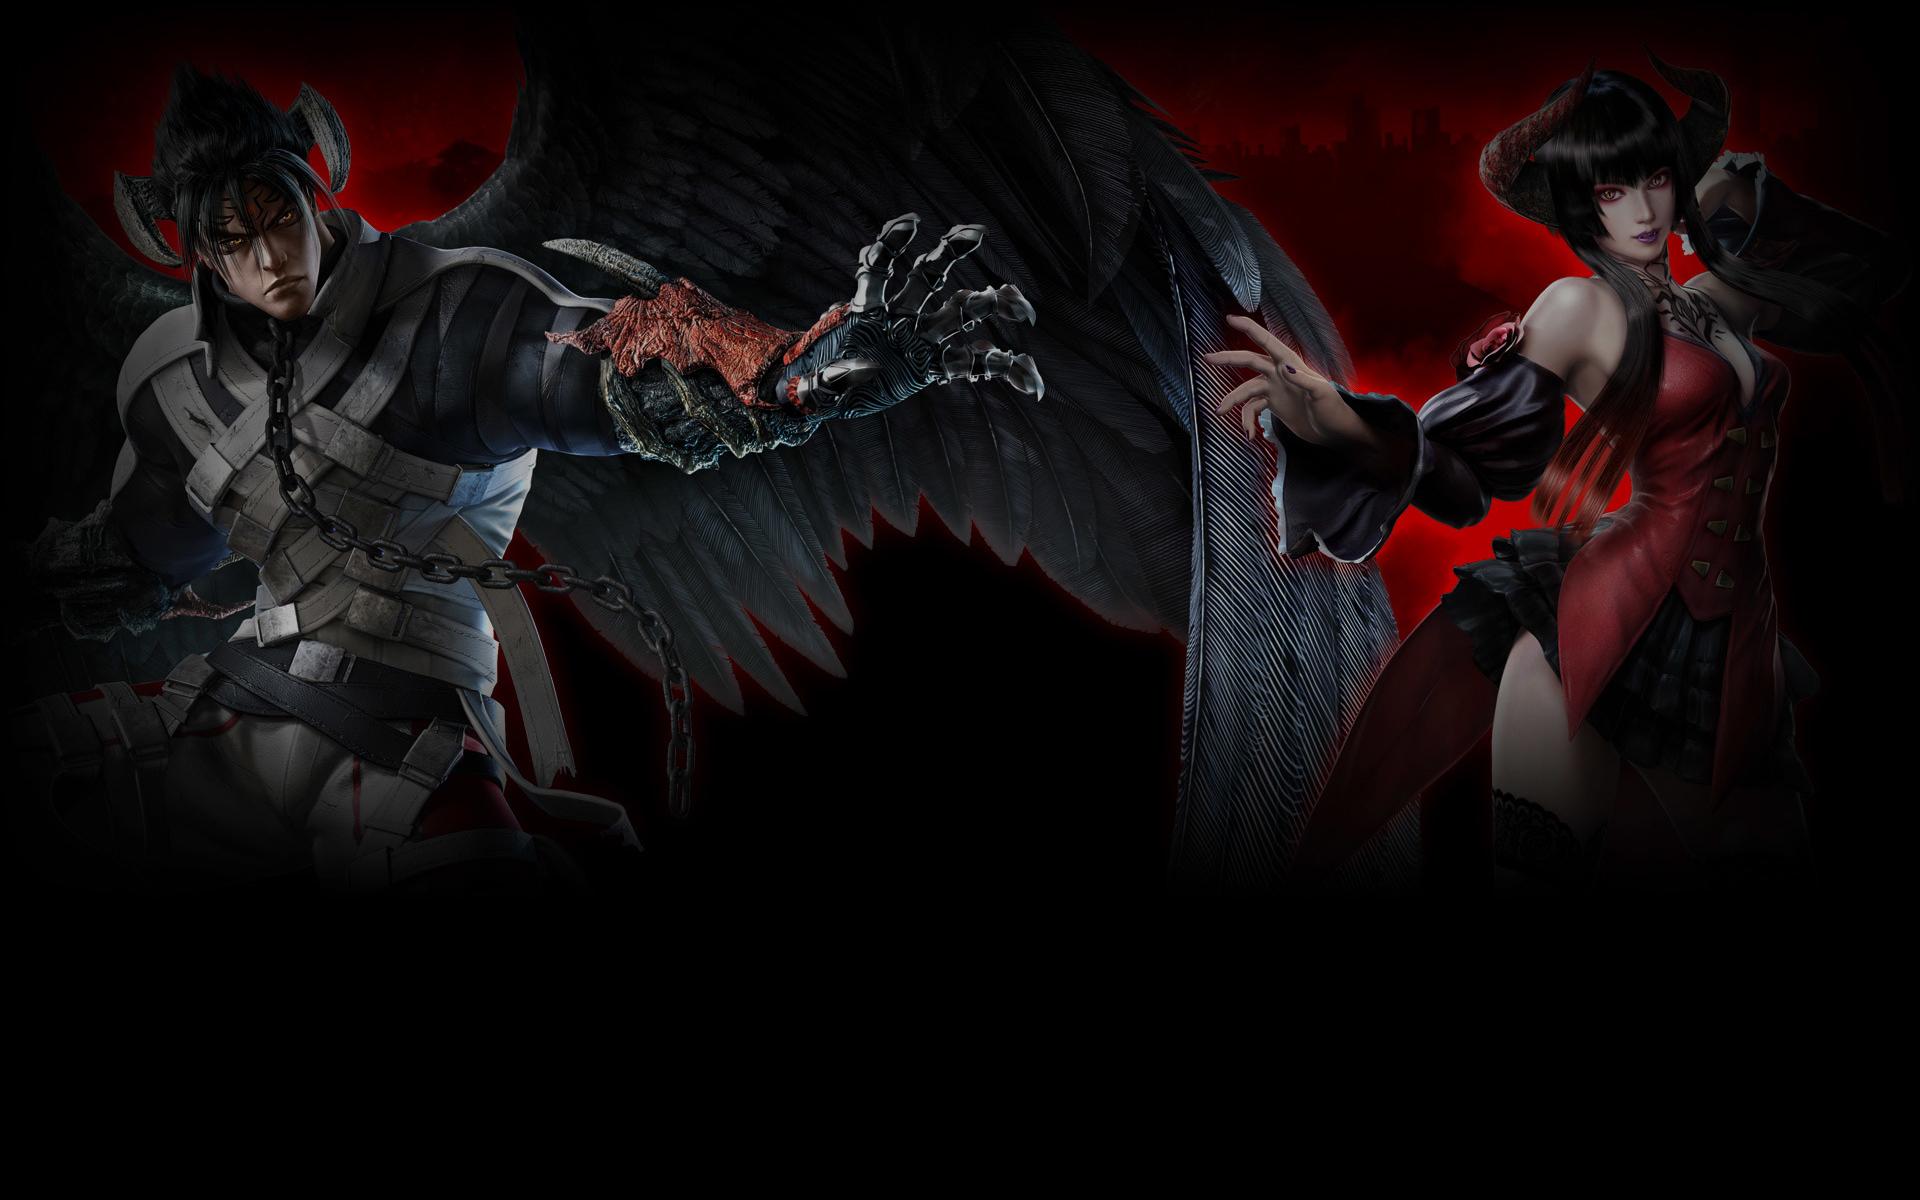 Tekken 7 Wallpaper 005 Devil Jin And Eliza Wallpapers Ethereal Games